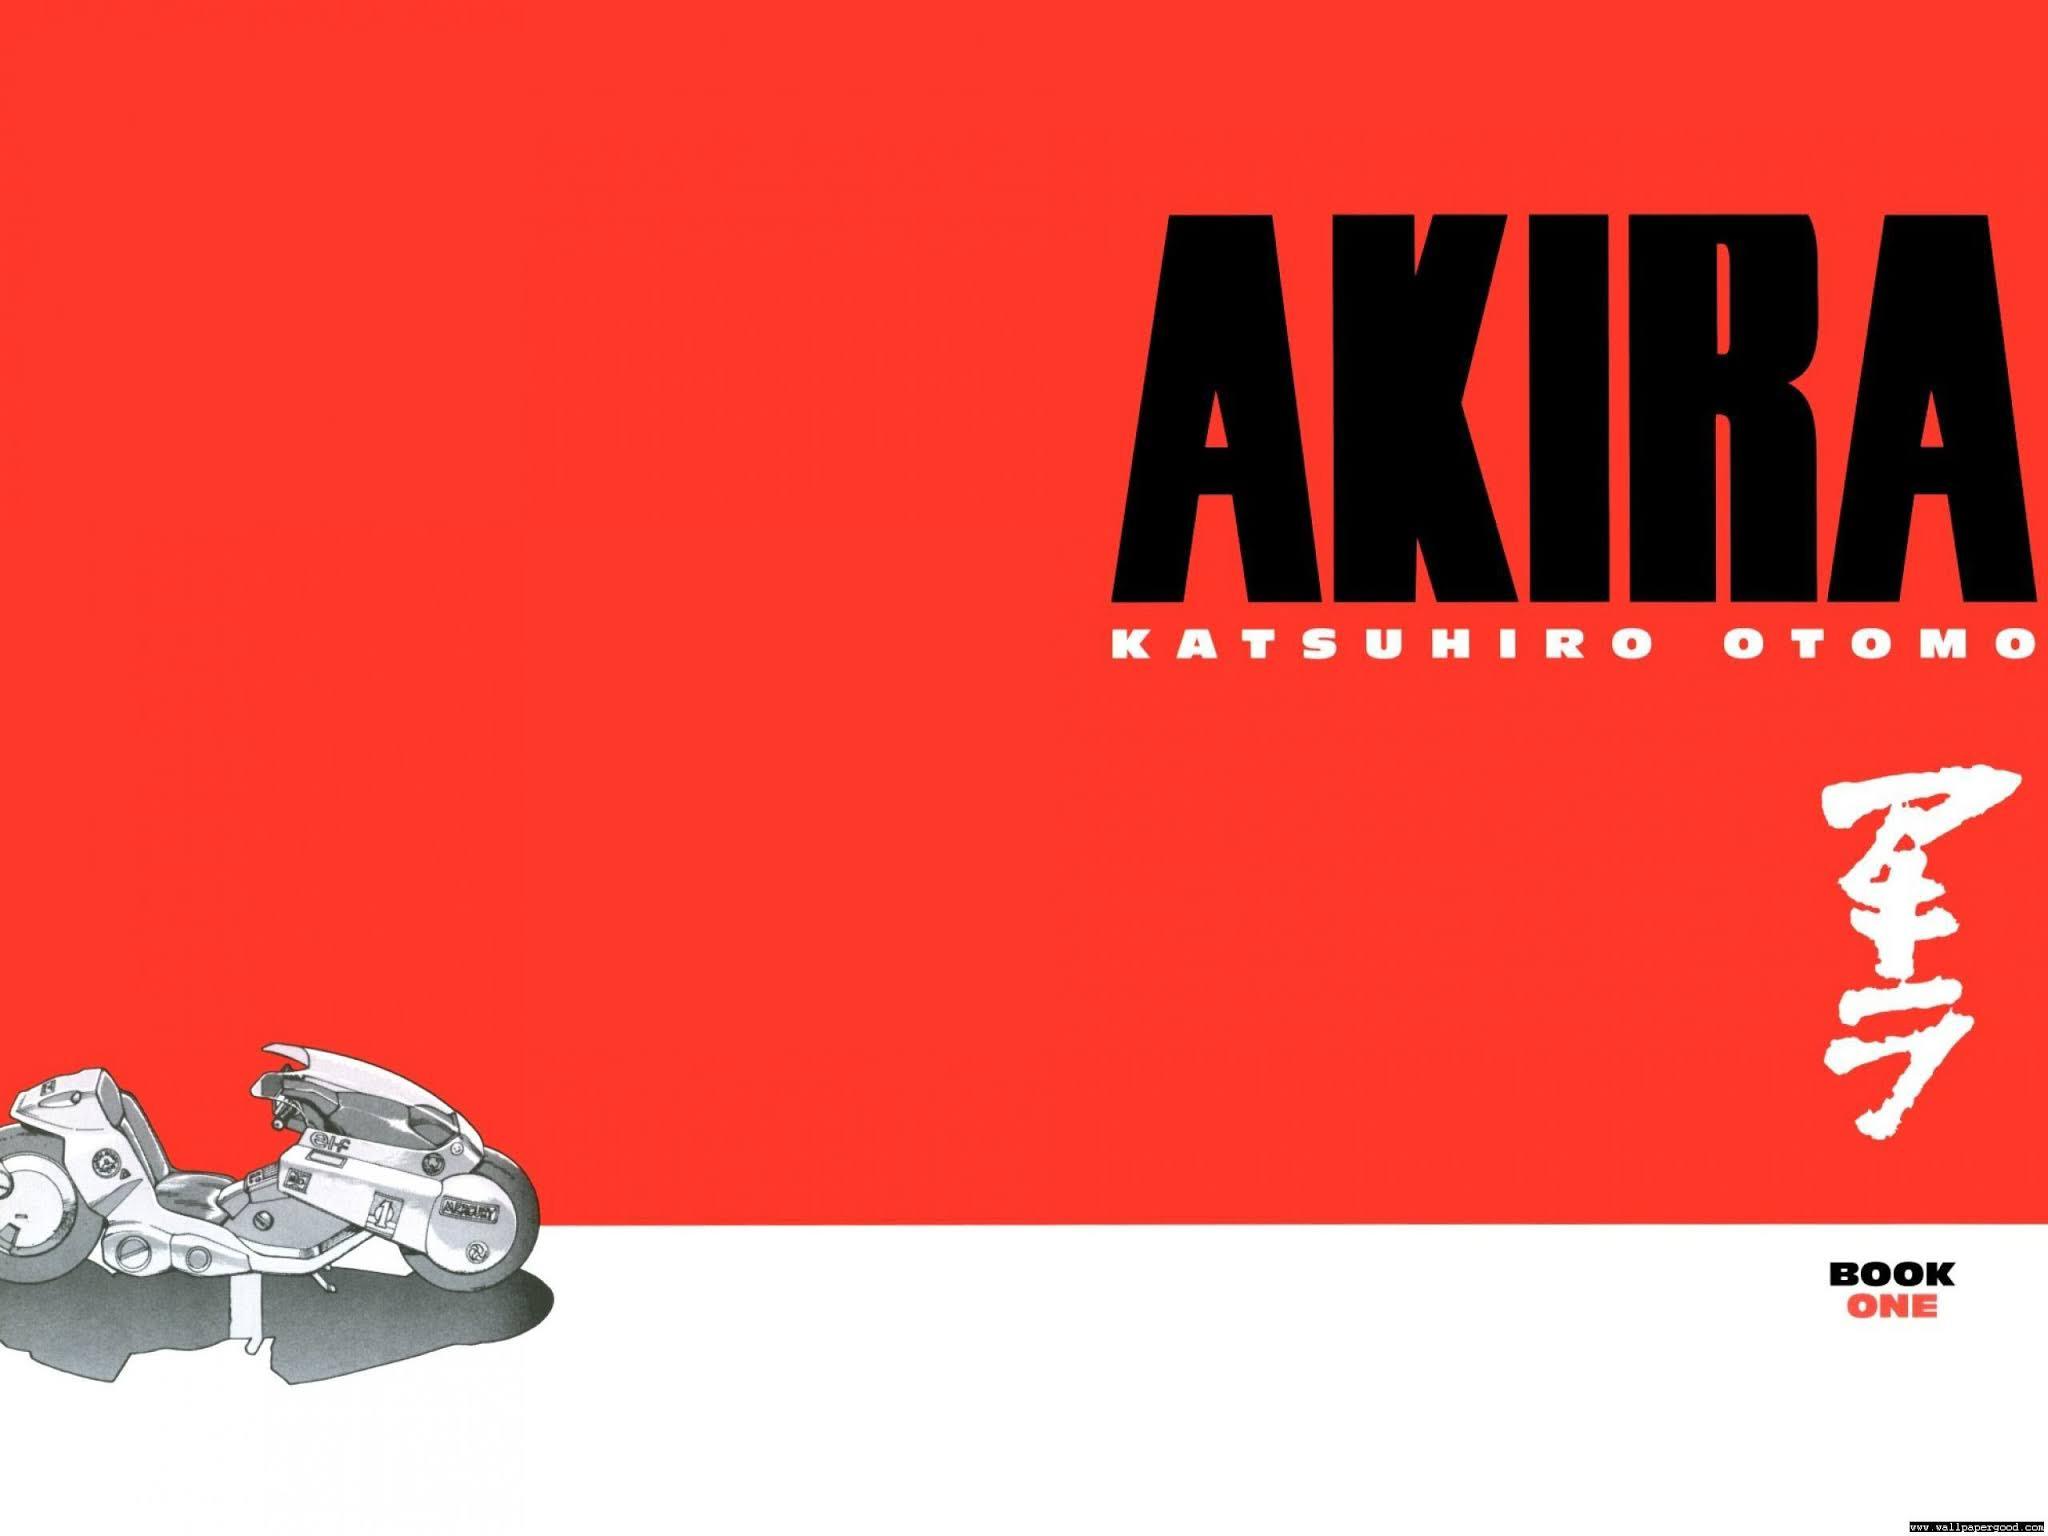 akira explosion wallpaper